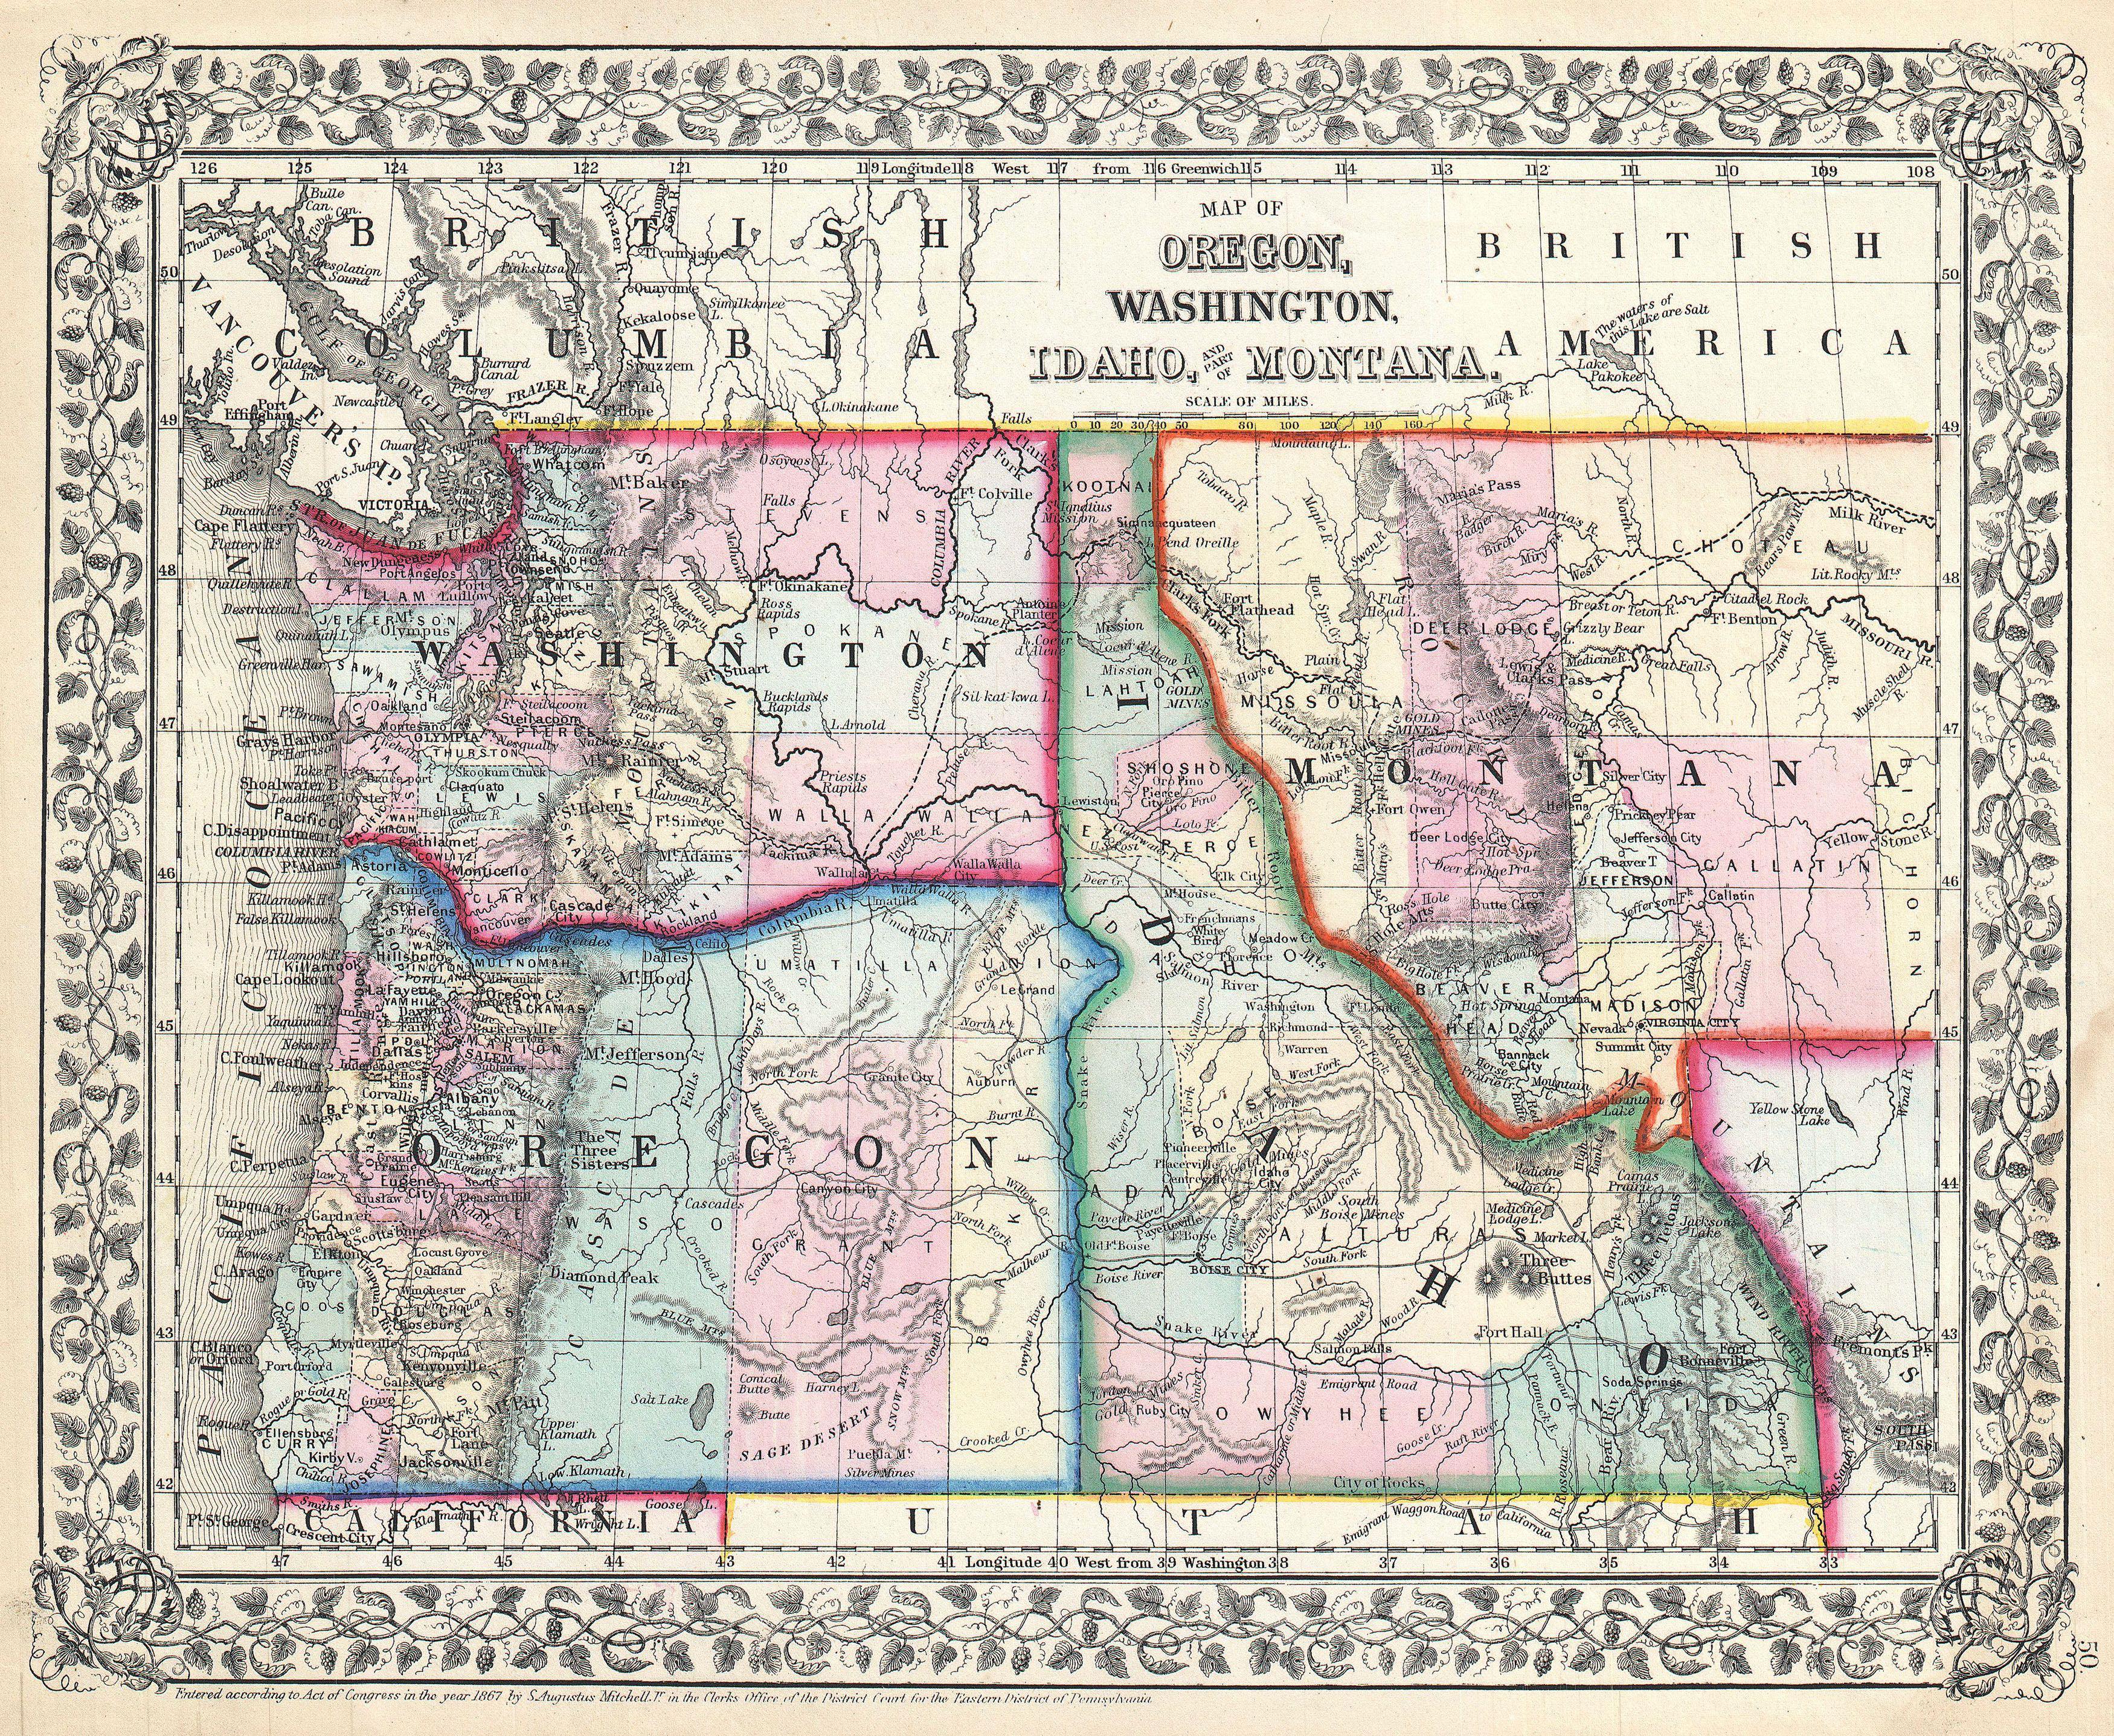 Idaho Montana Washington Map